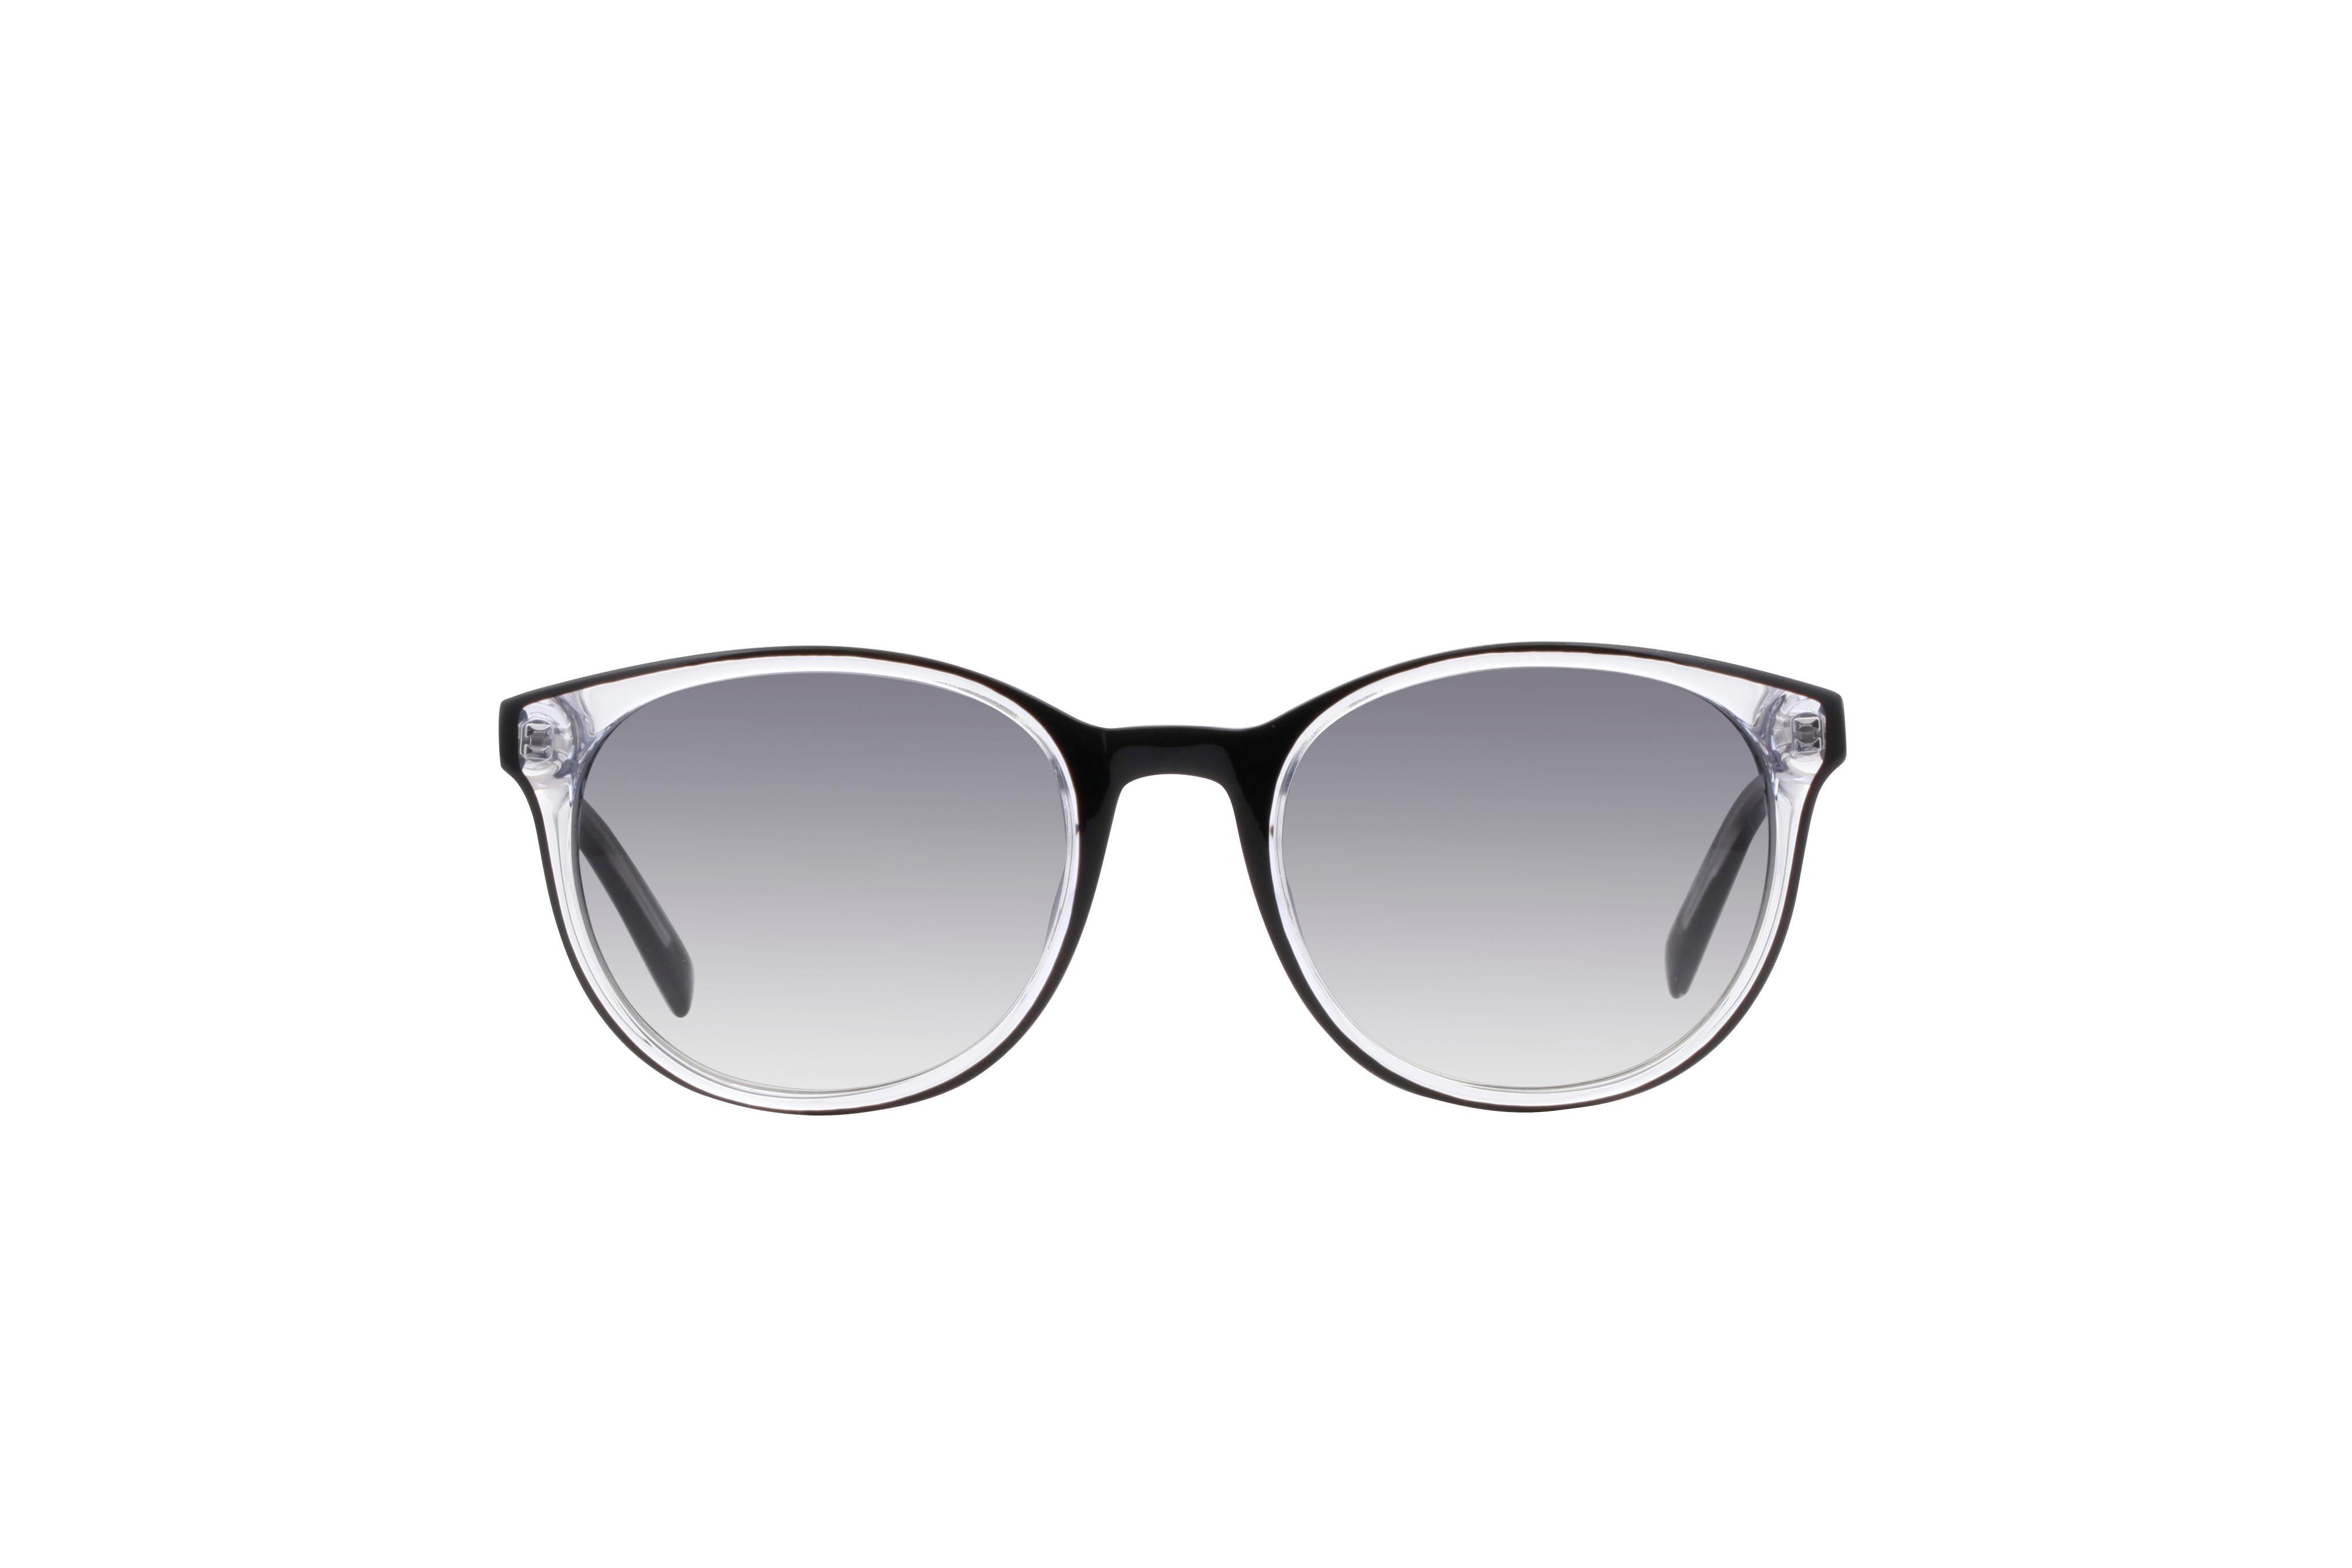 Front Esprit Esprit 17997 538 52/20 Zwart, Transparant/Grijs